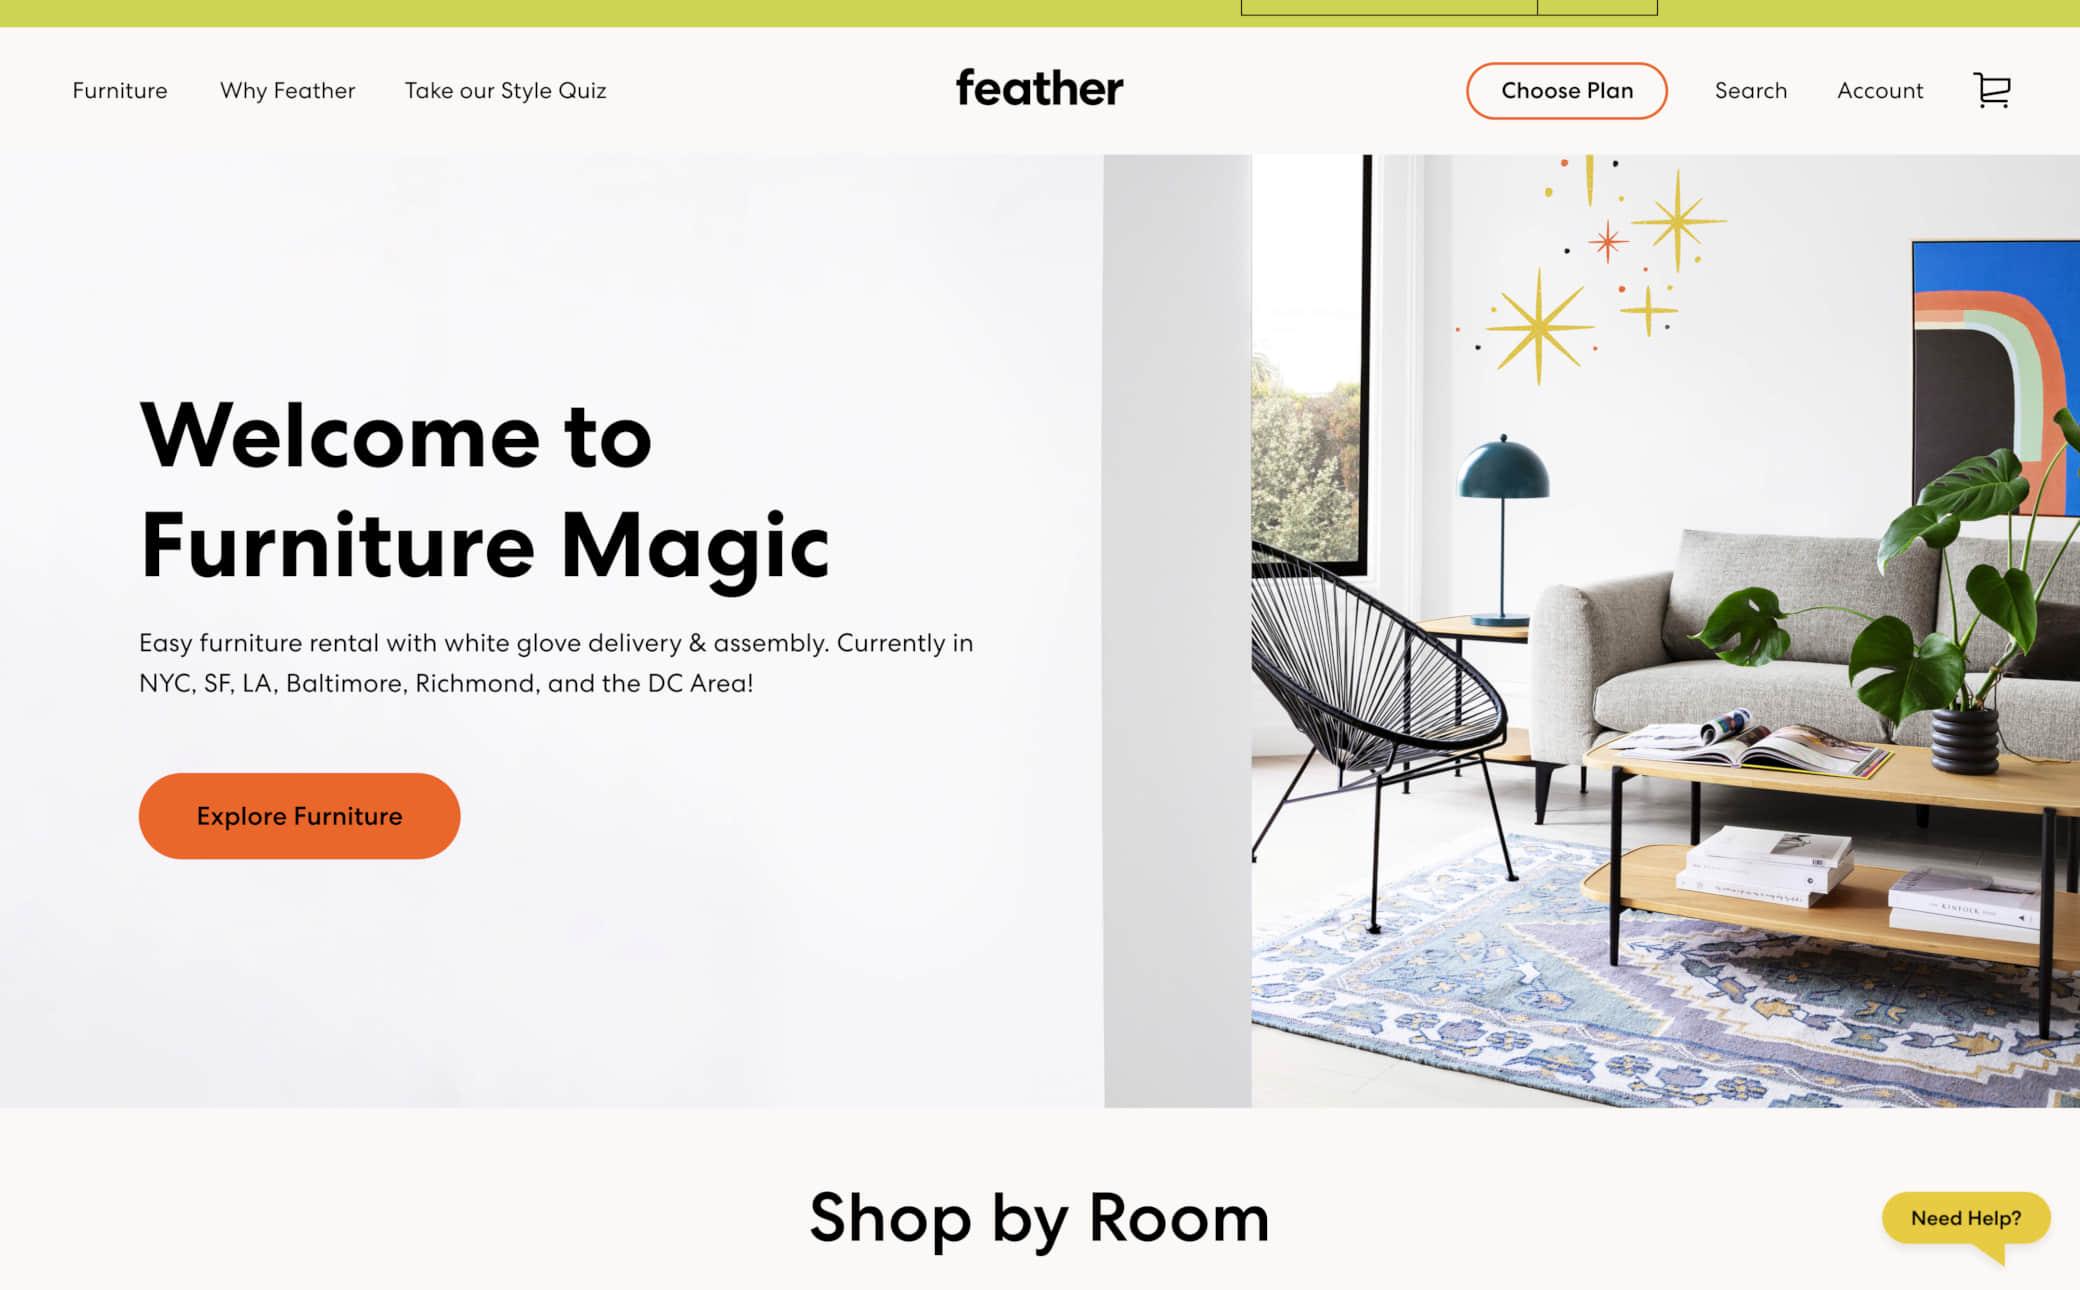 Feather Screenshot Main